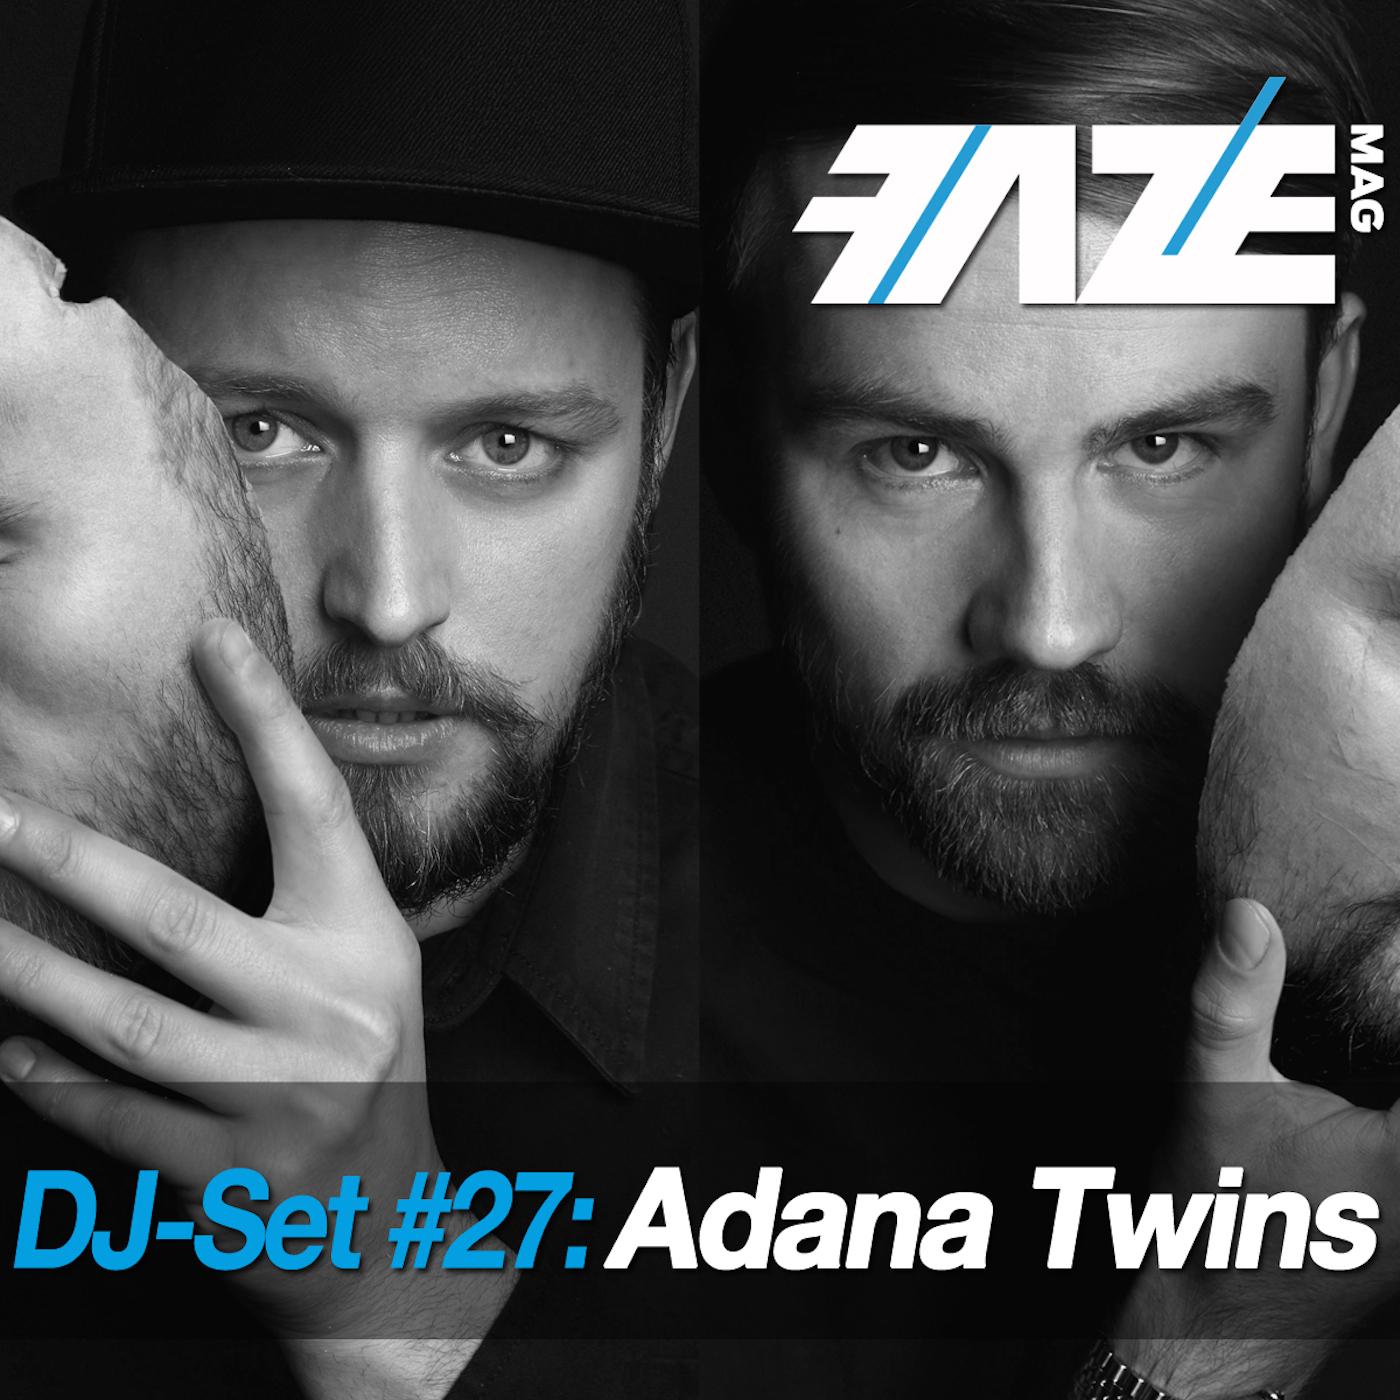 FAZEmag DJ-Set #27: Adana Twins – exklusiv bei iTunes